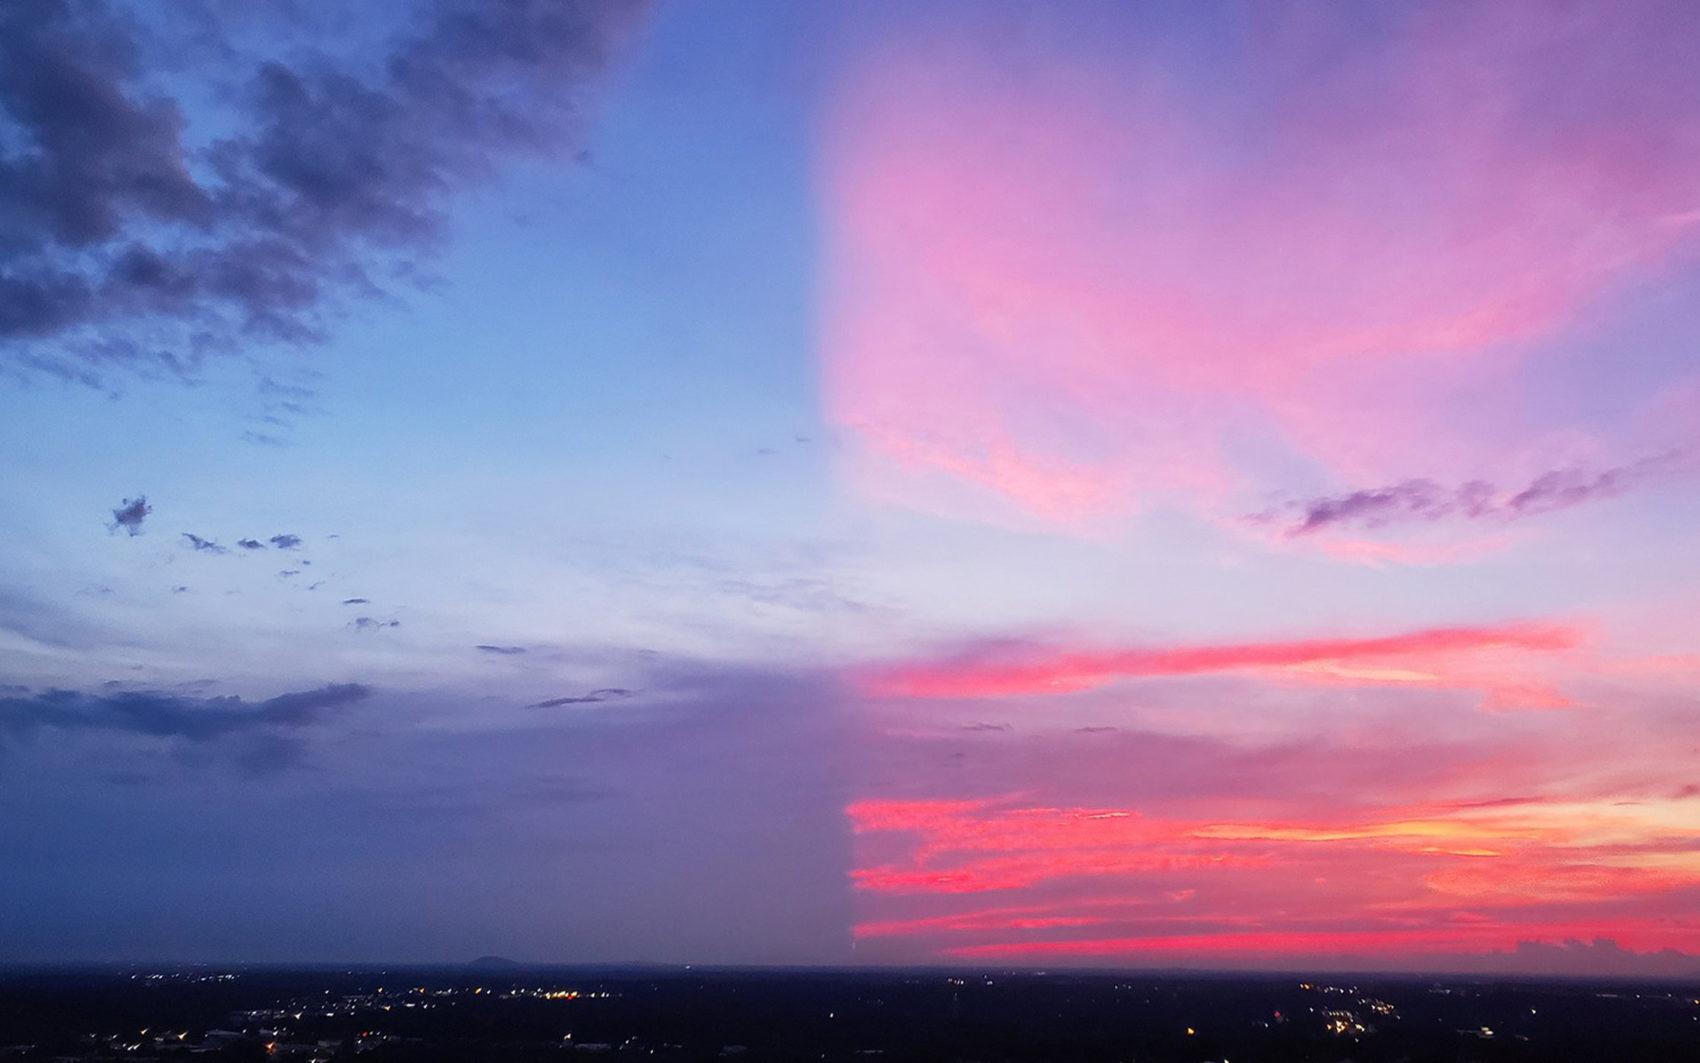 split sunset, sunset, photograph